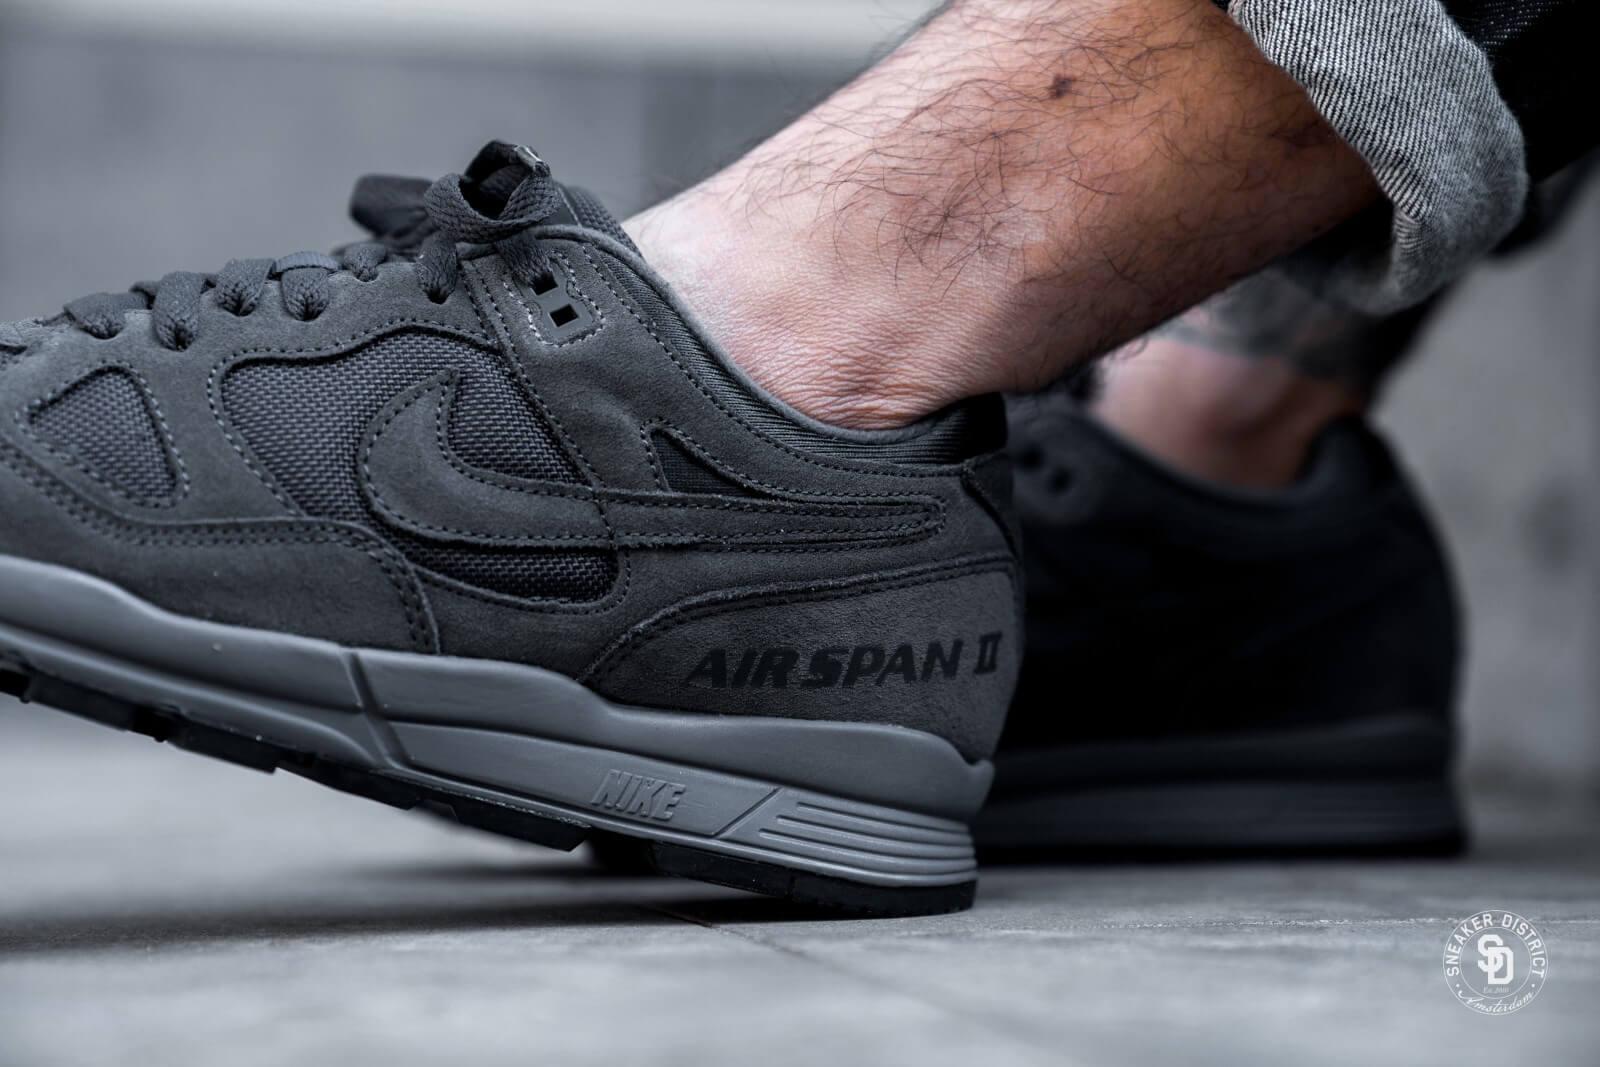 Nike Air Span II Premium AnthraciteDark Grey Black AO1546 001